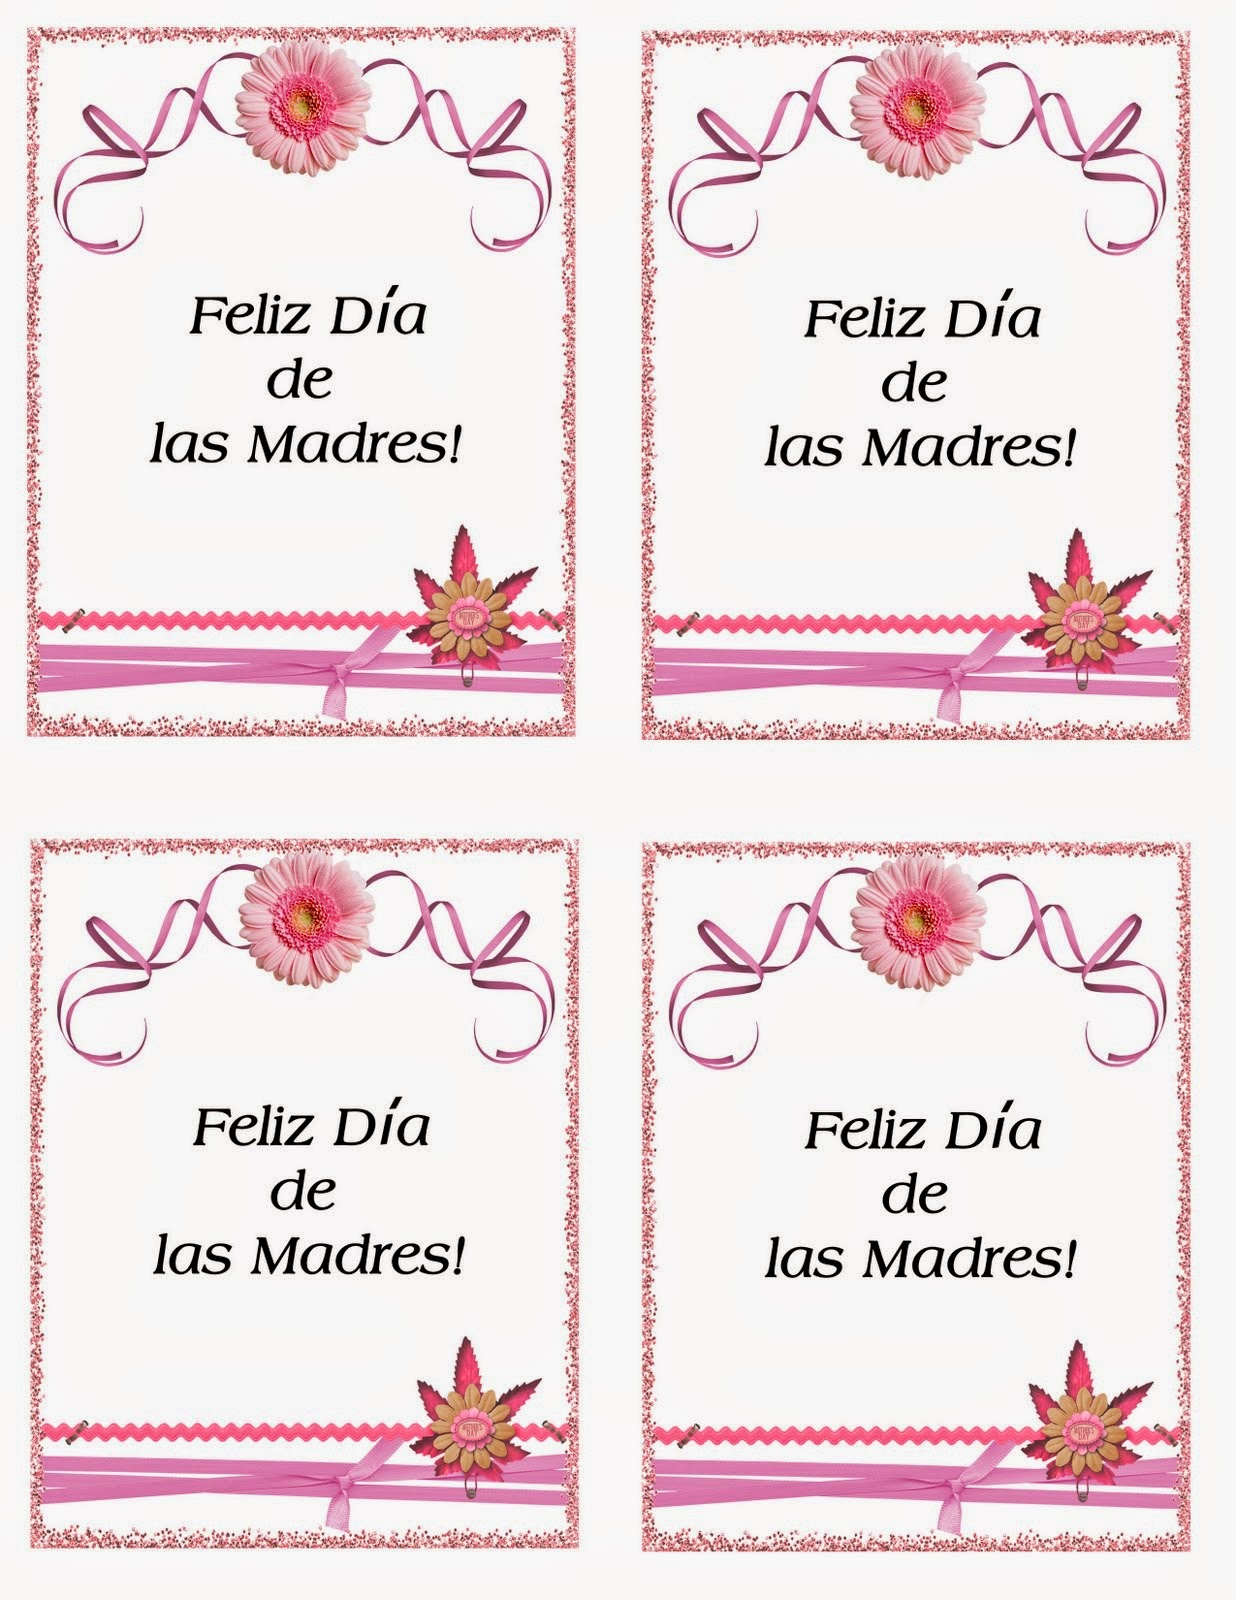 Fondos para tarjetas madre tattoo design bild - Tarjetas de navidad artesanales ...